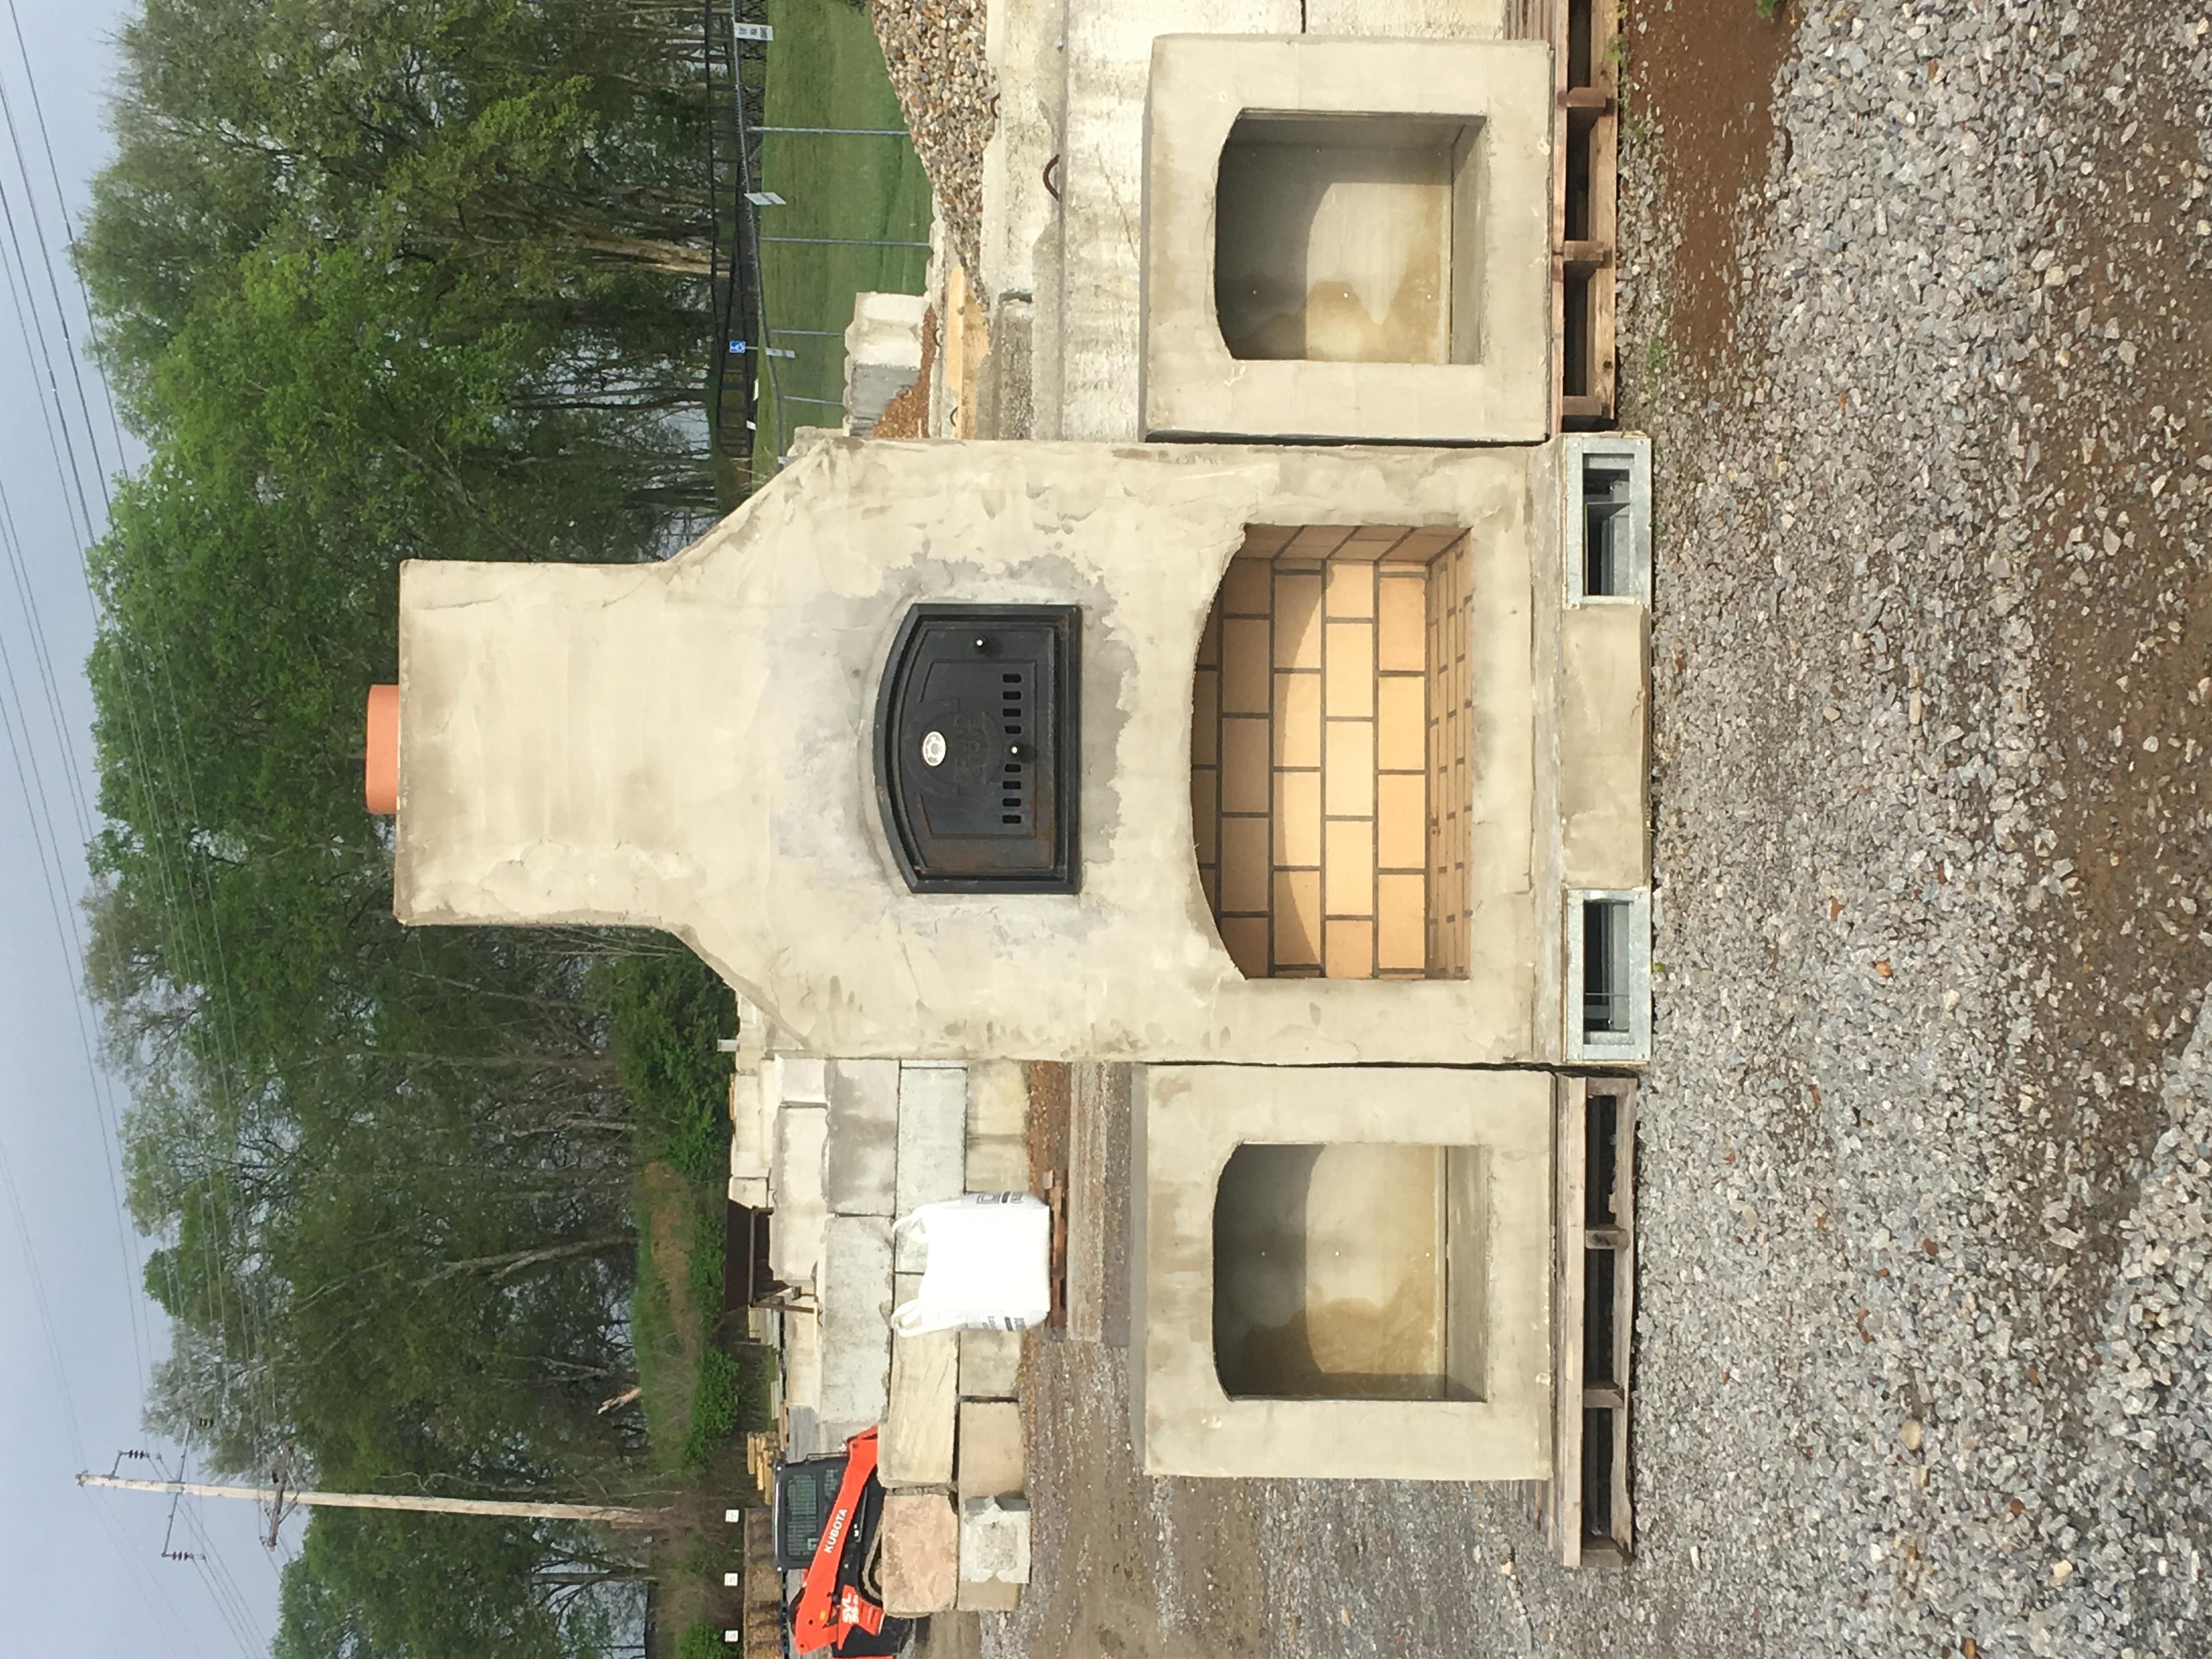 Prebuilt outdoor fireplace kit